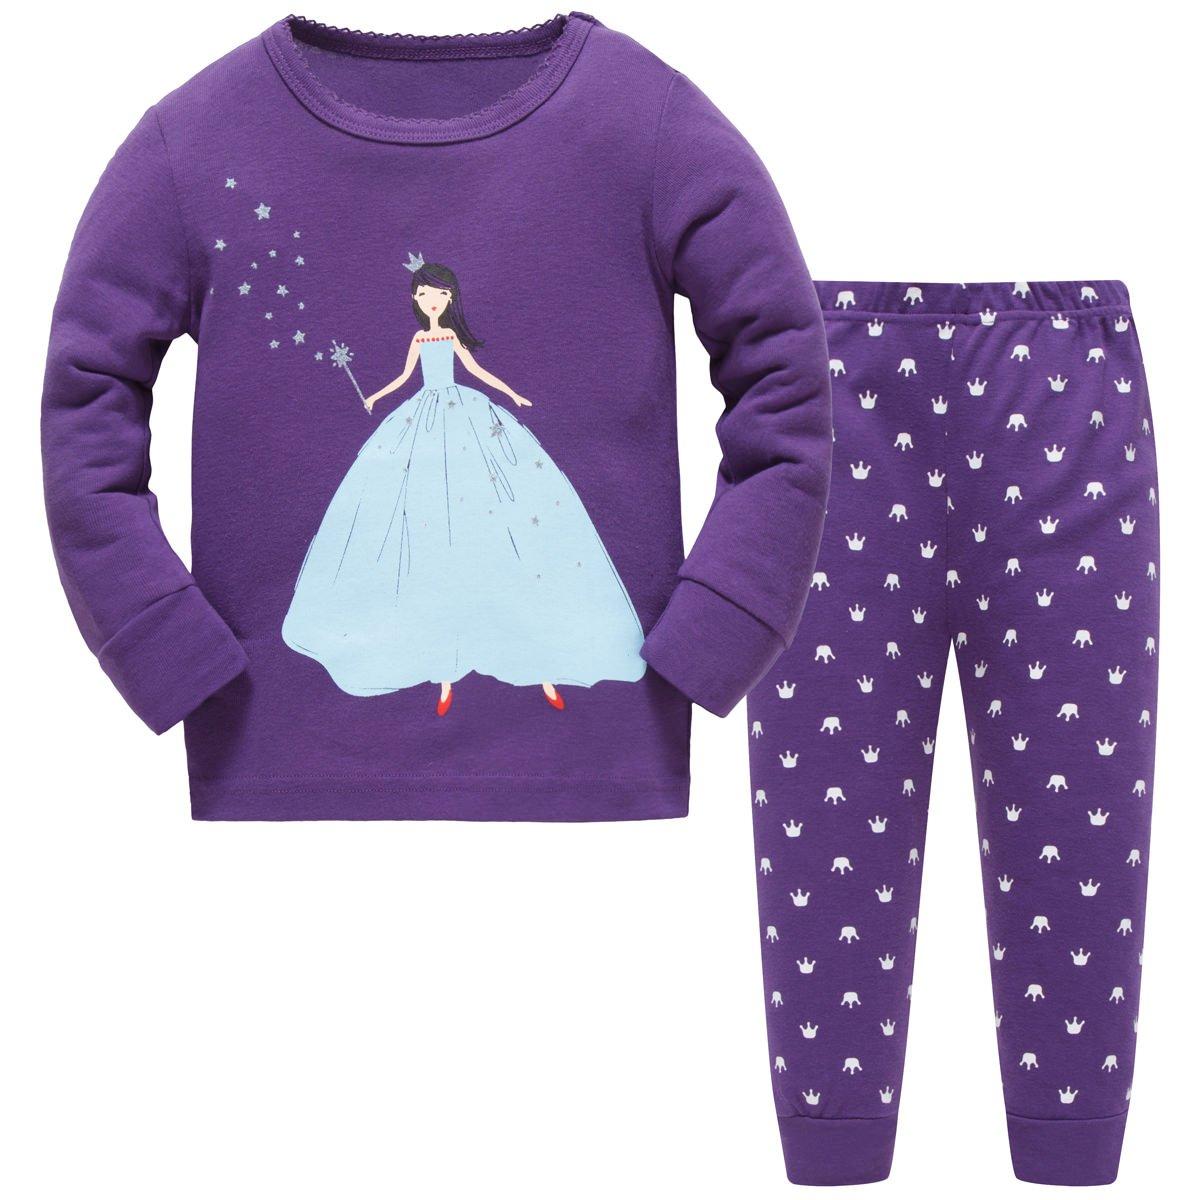 1b20016c5884 Amazon.com  Hugbug Toddler Girls Funny Dance Pajama Set 2-7T  Clothing